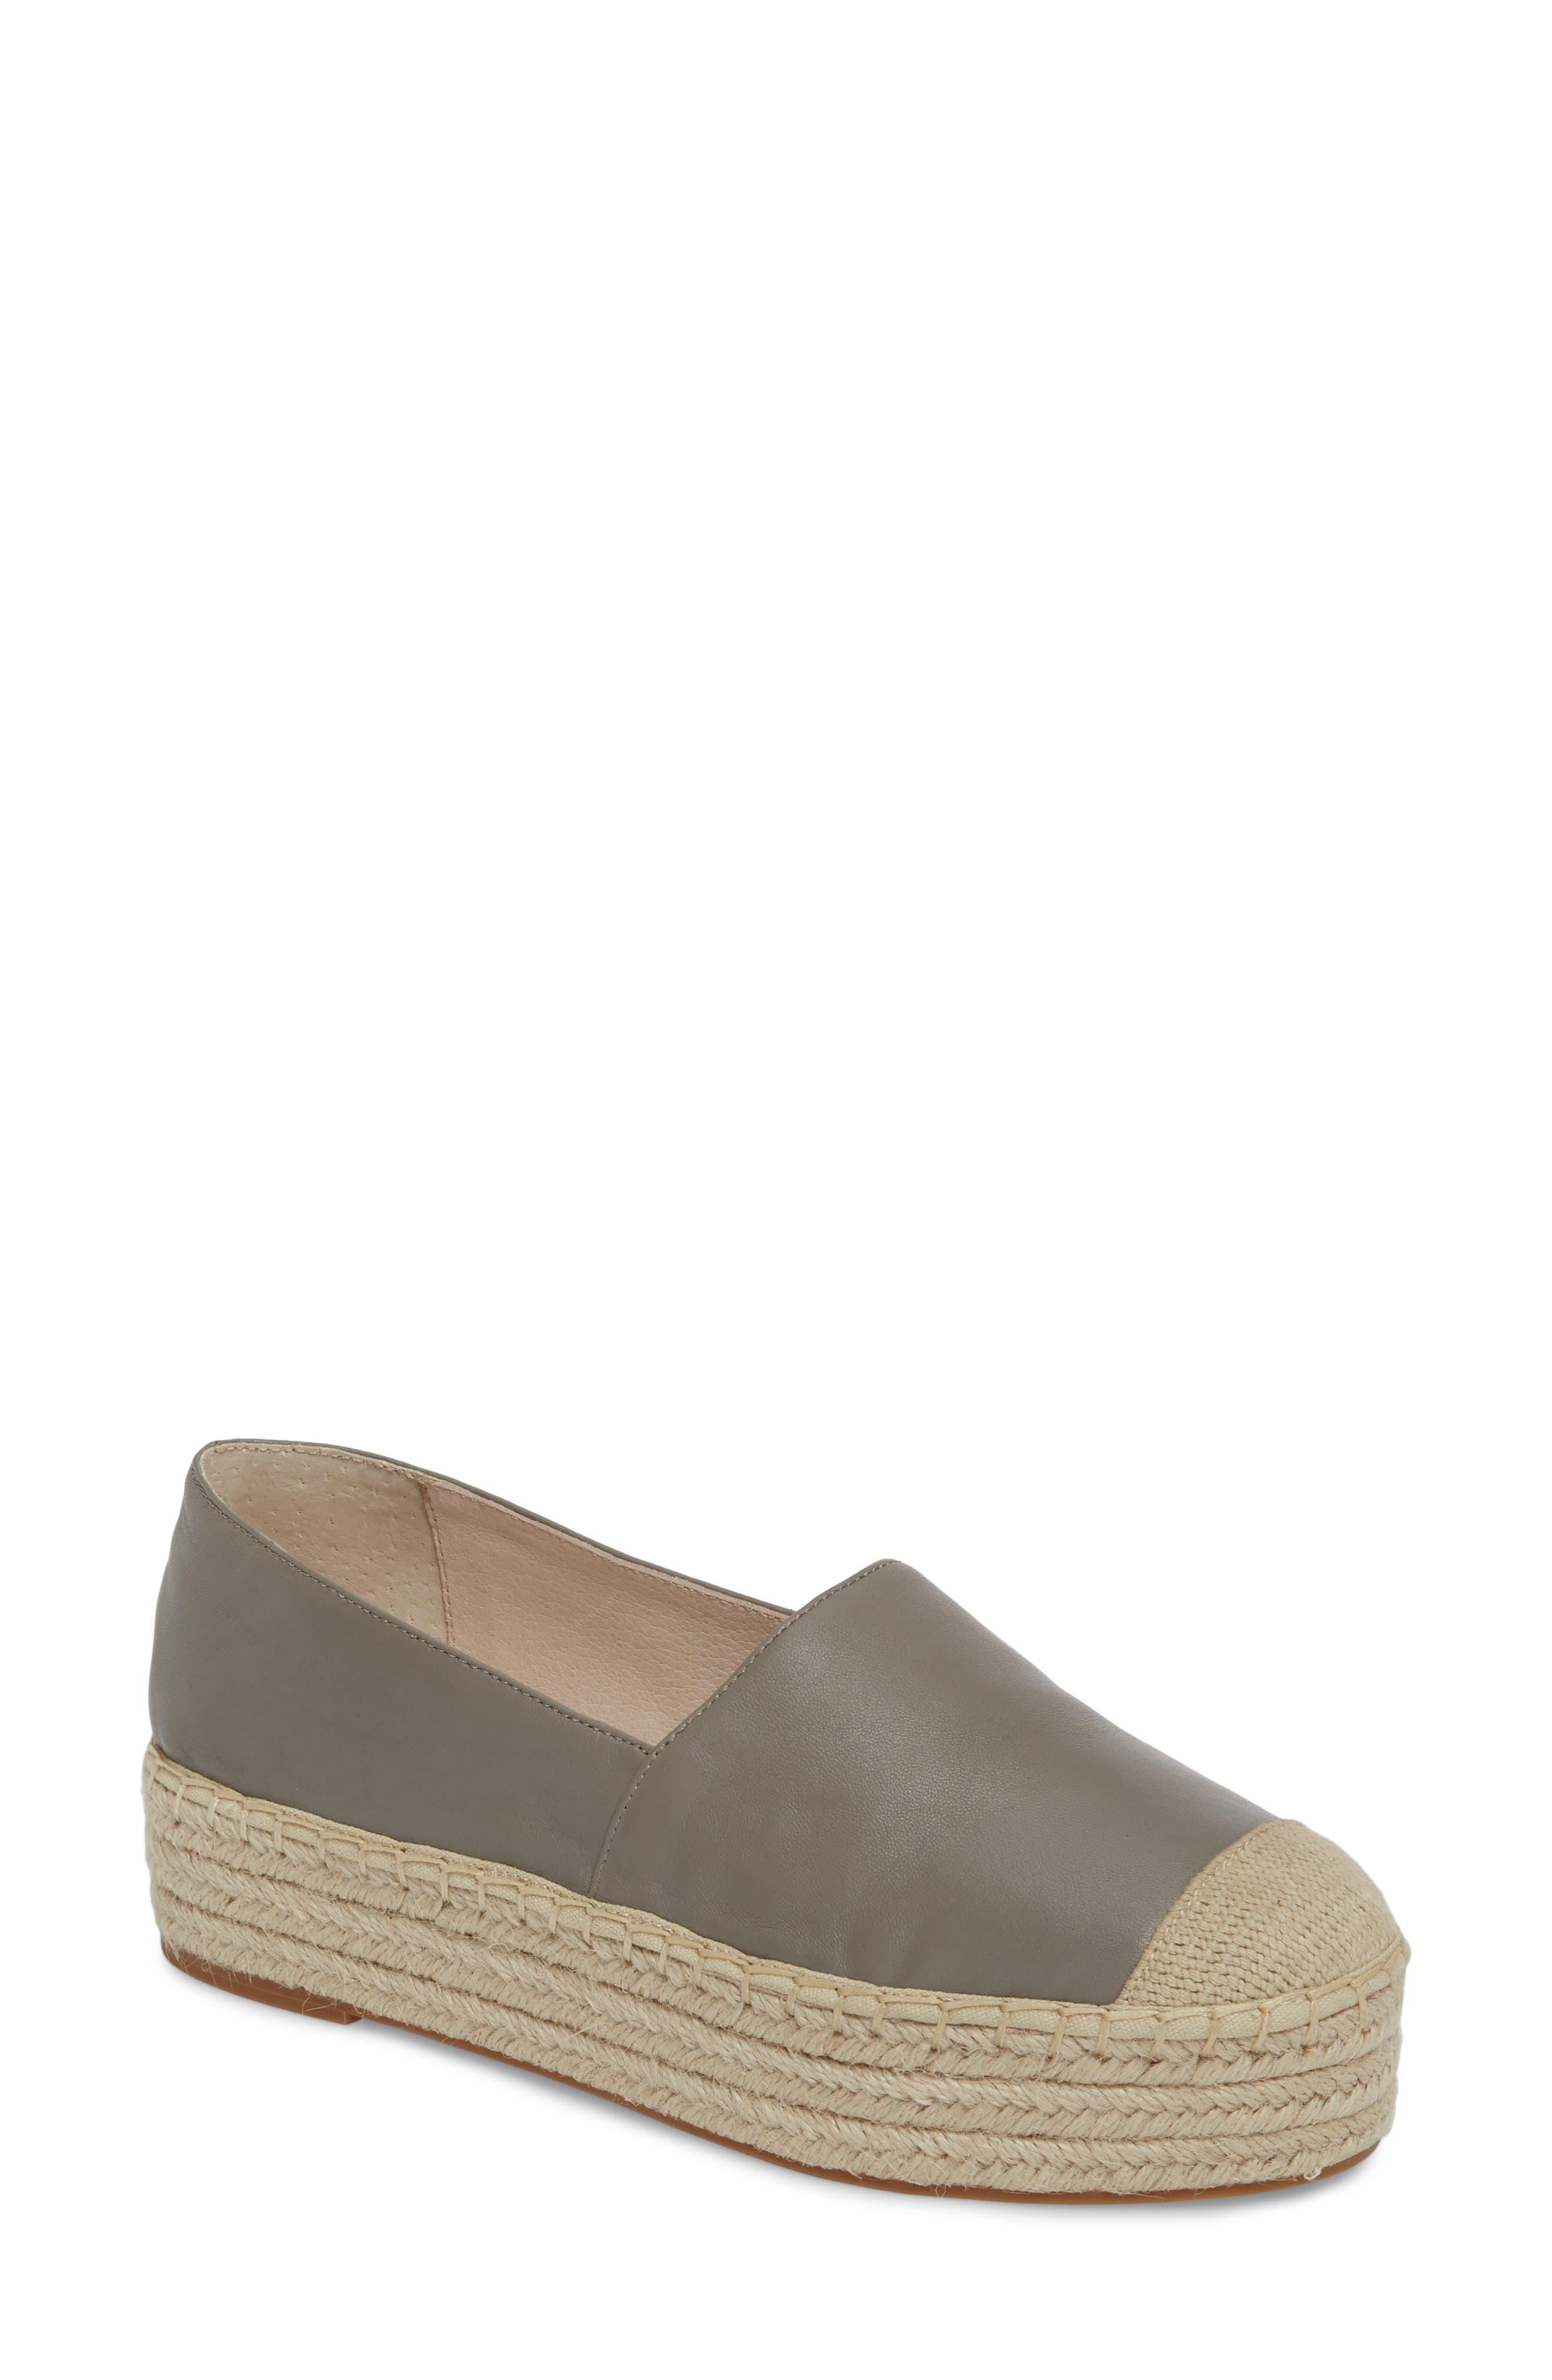 Collins Lea Espadrille Platform Slip-On,                             Main thumbnail 1, color,                             Grey Leather